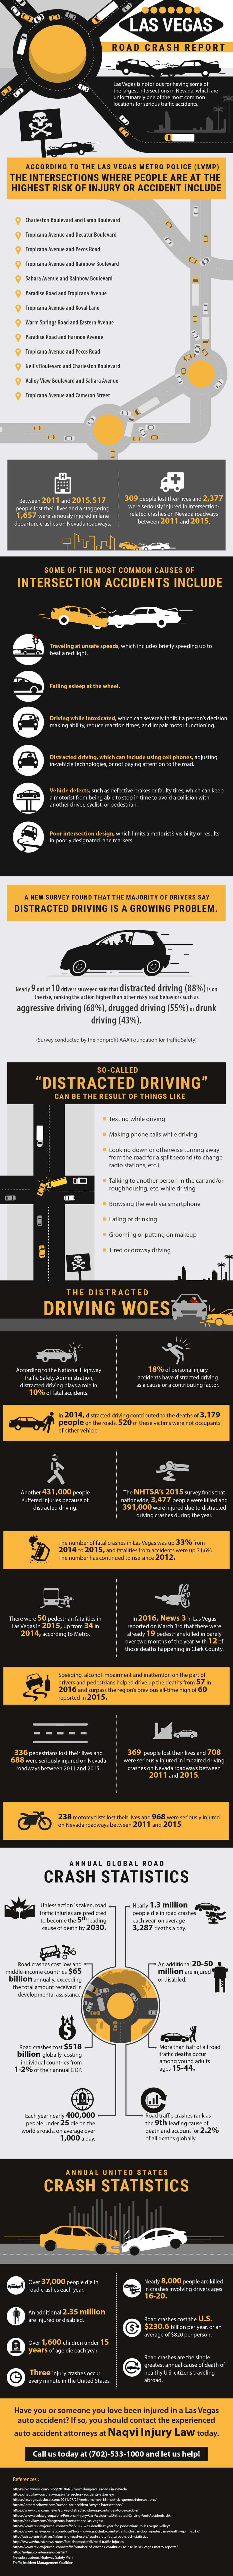 Las Vegas Road Crash Report